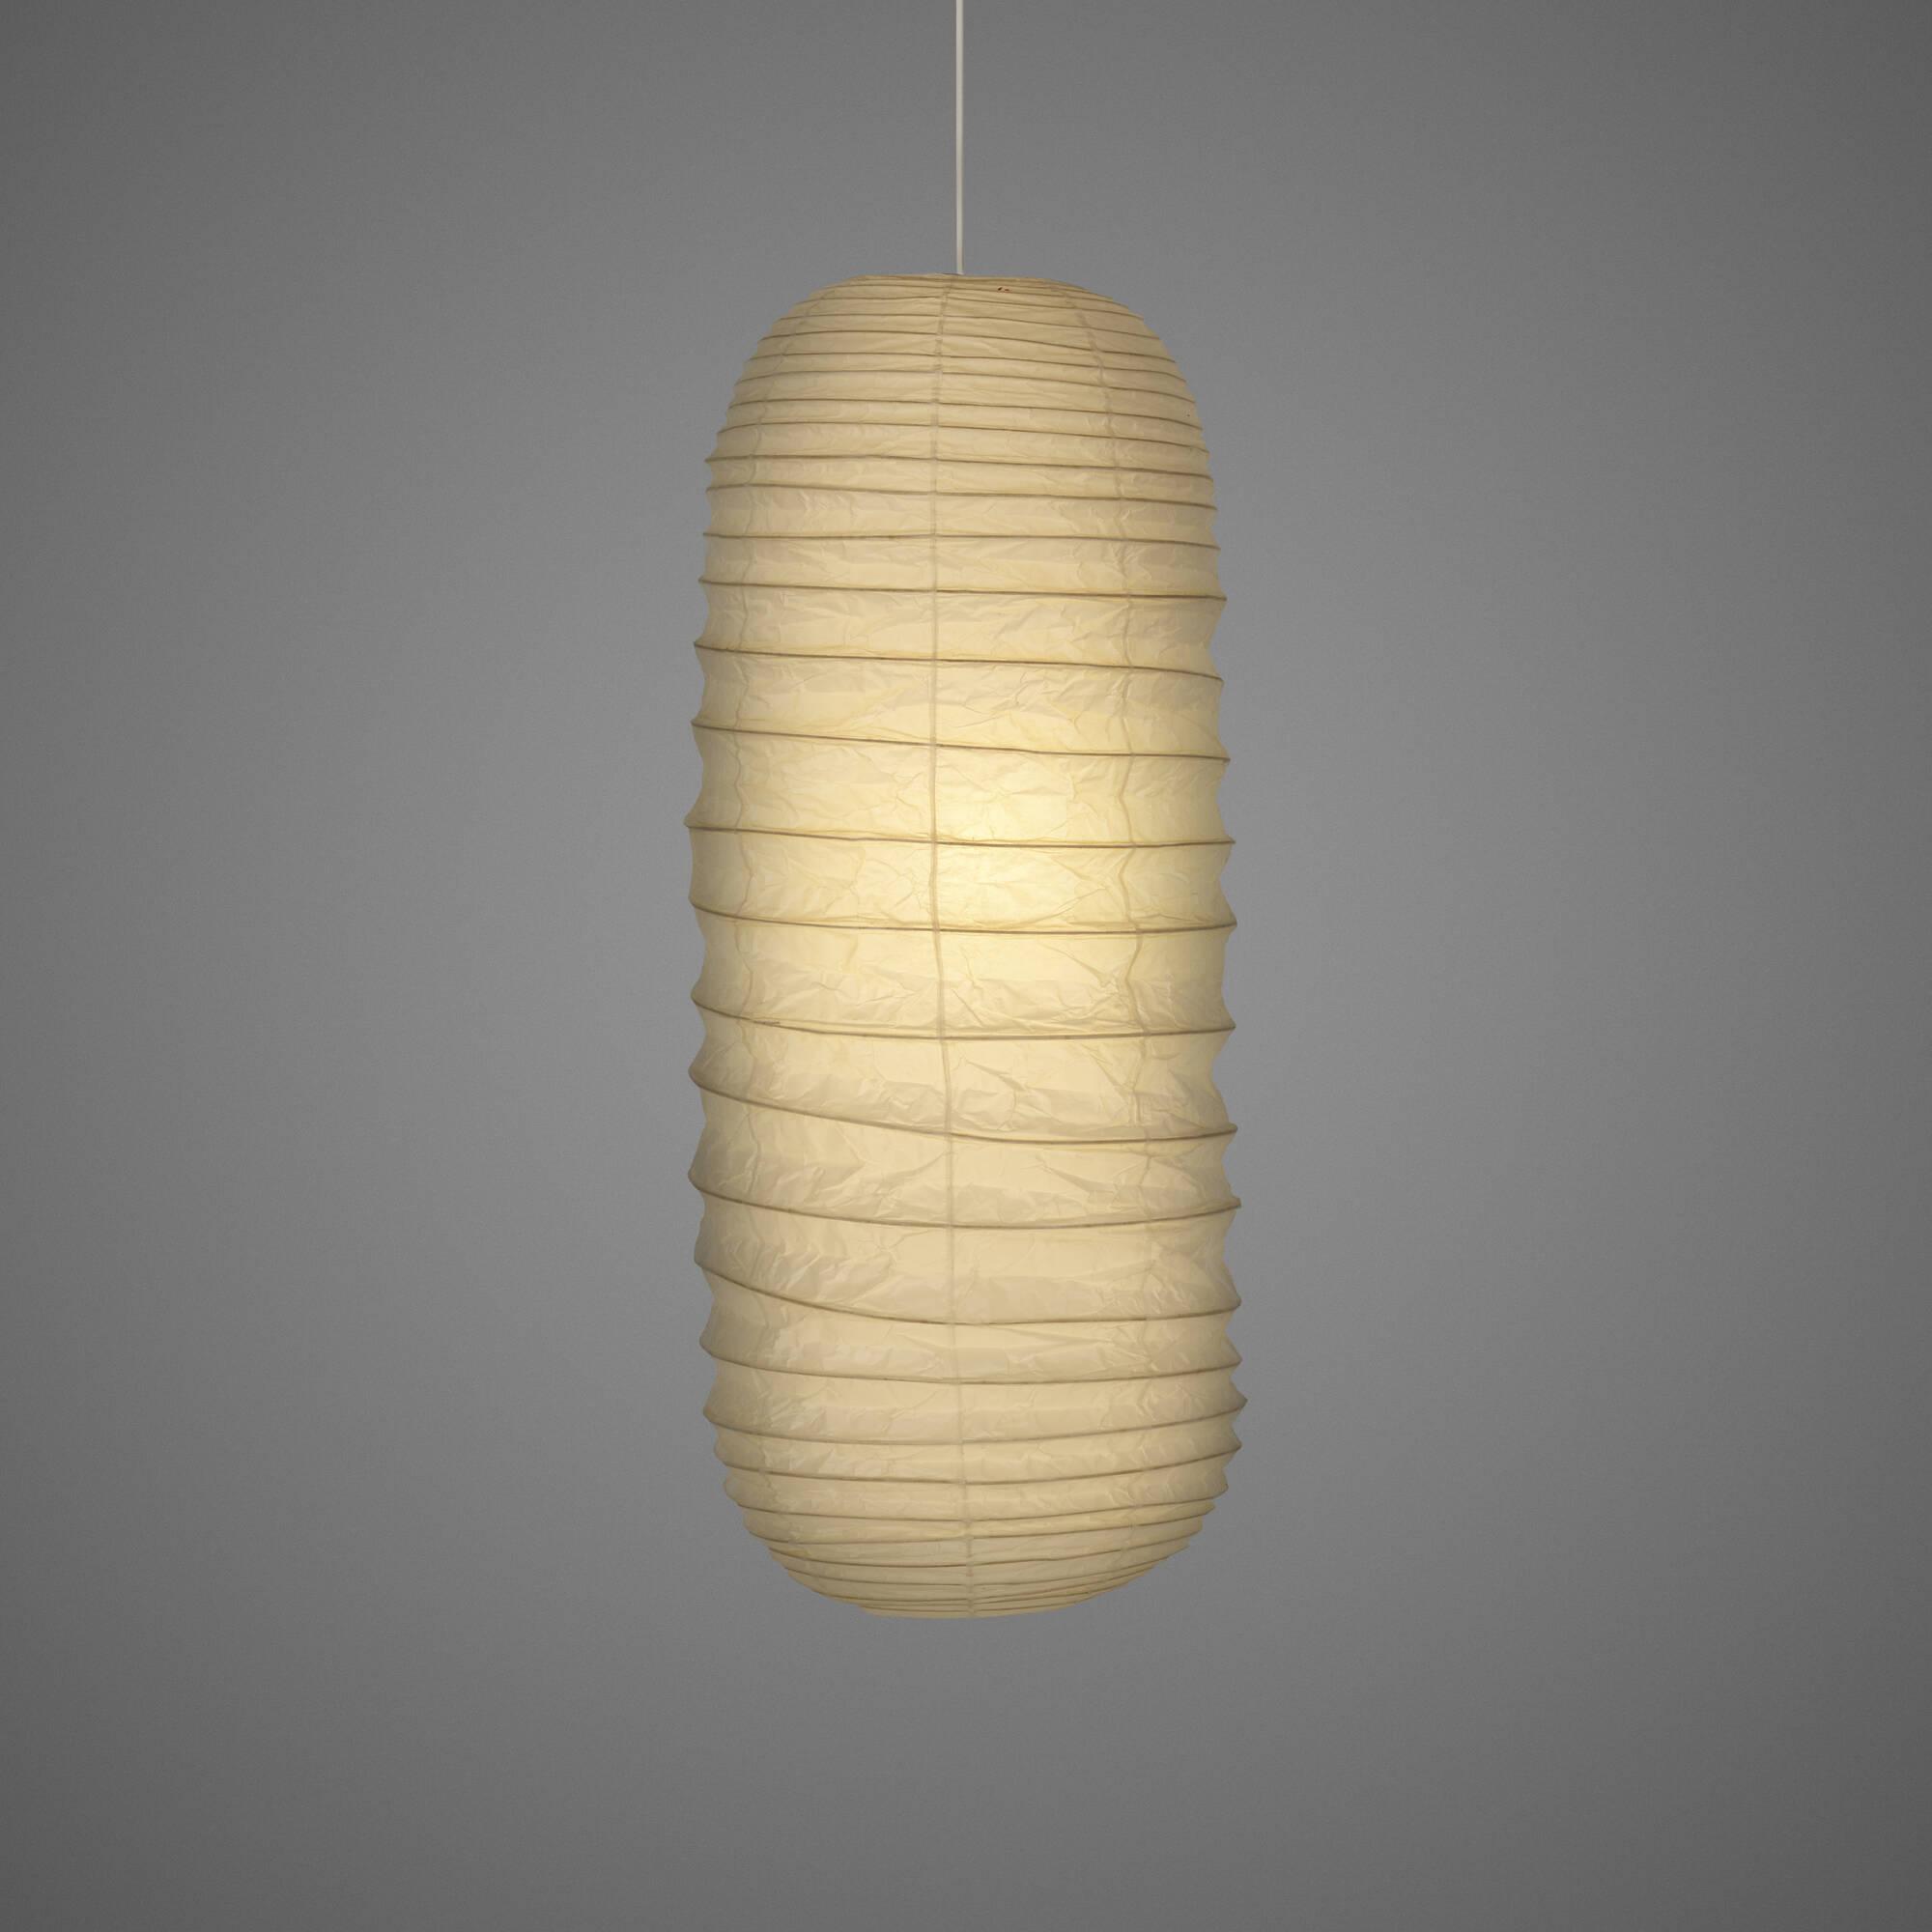 378: ISAMU NOGUCHI, Akari Hanging Lamp, Model L5